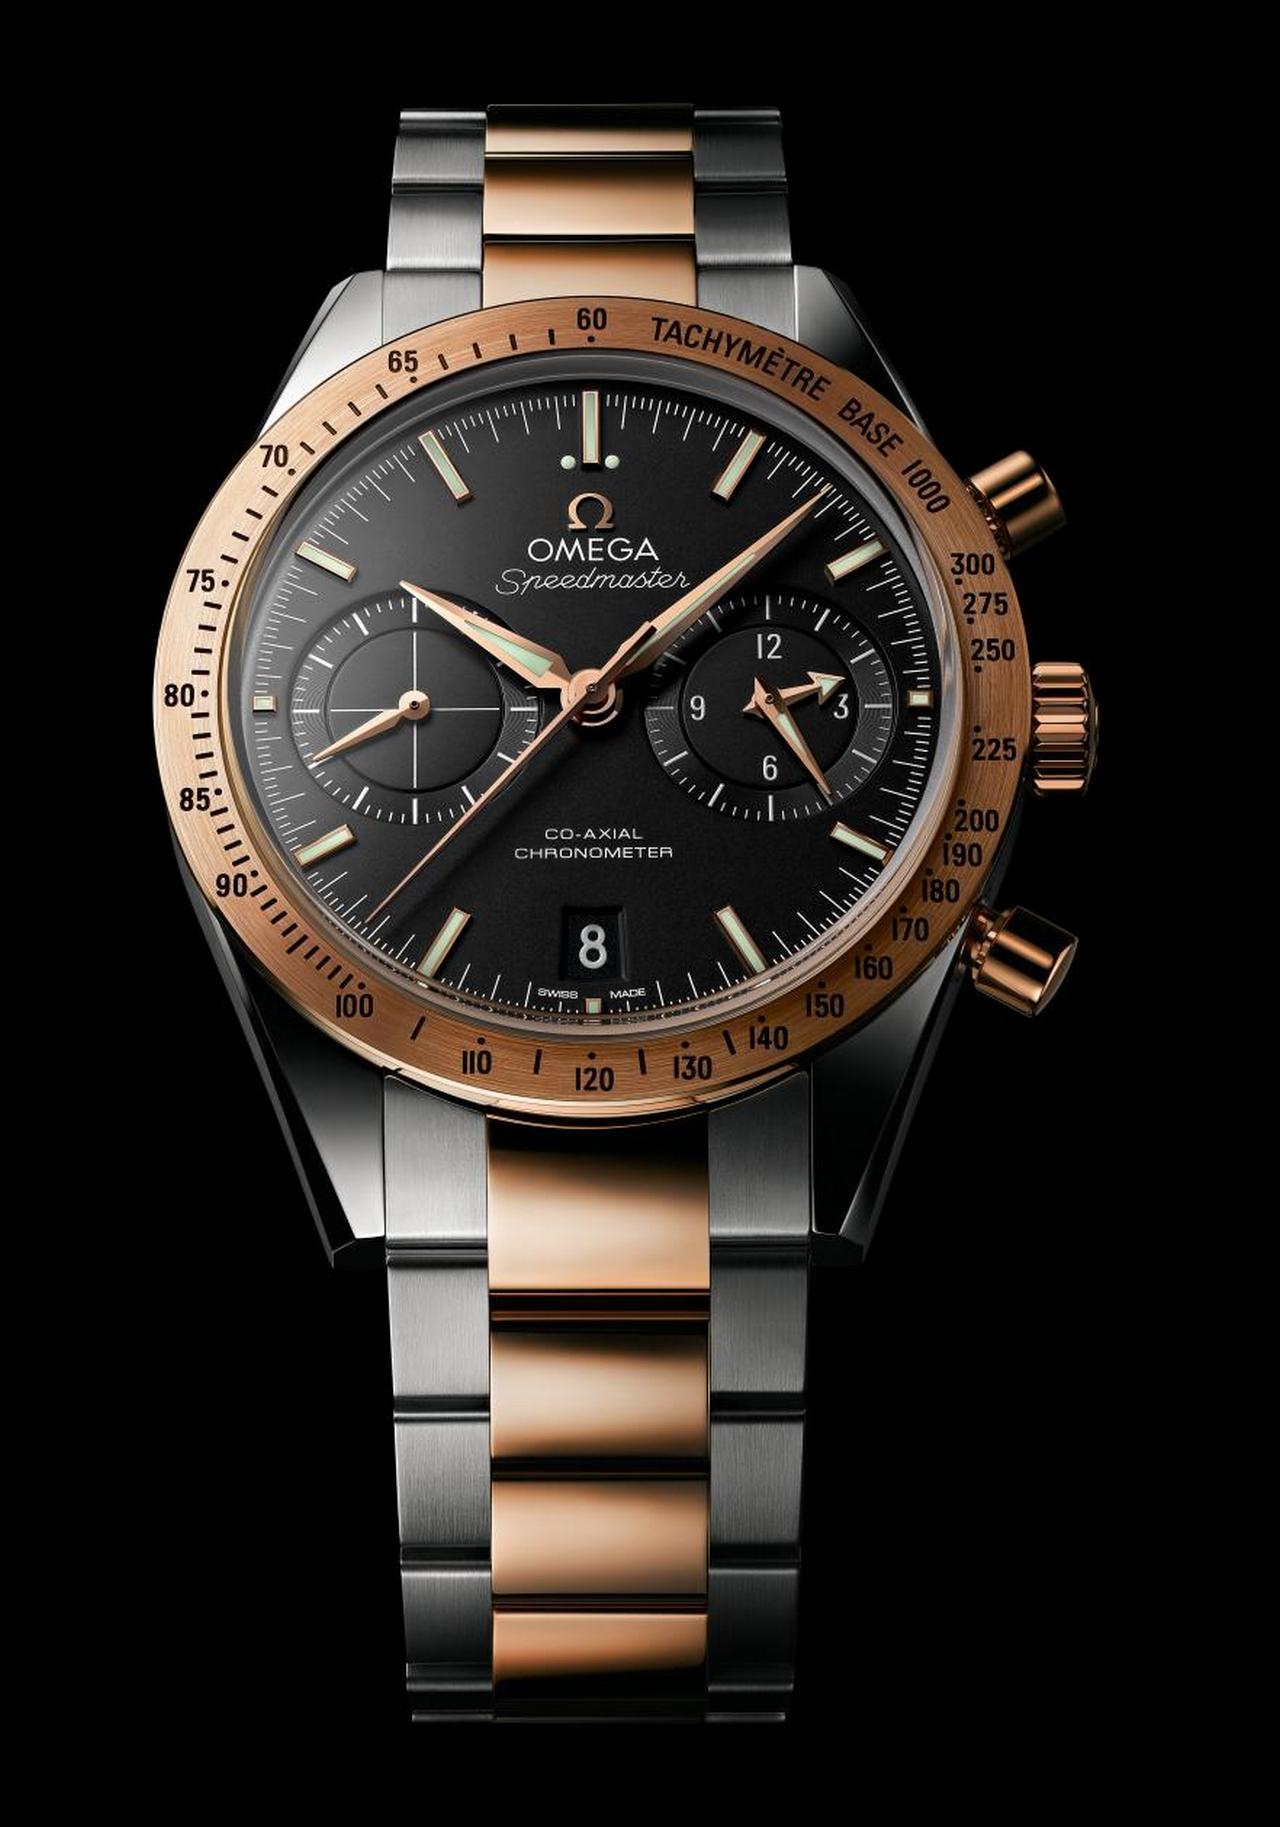 omega-speedmaster-57-co-axial-chronograph_0-100_130-100